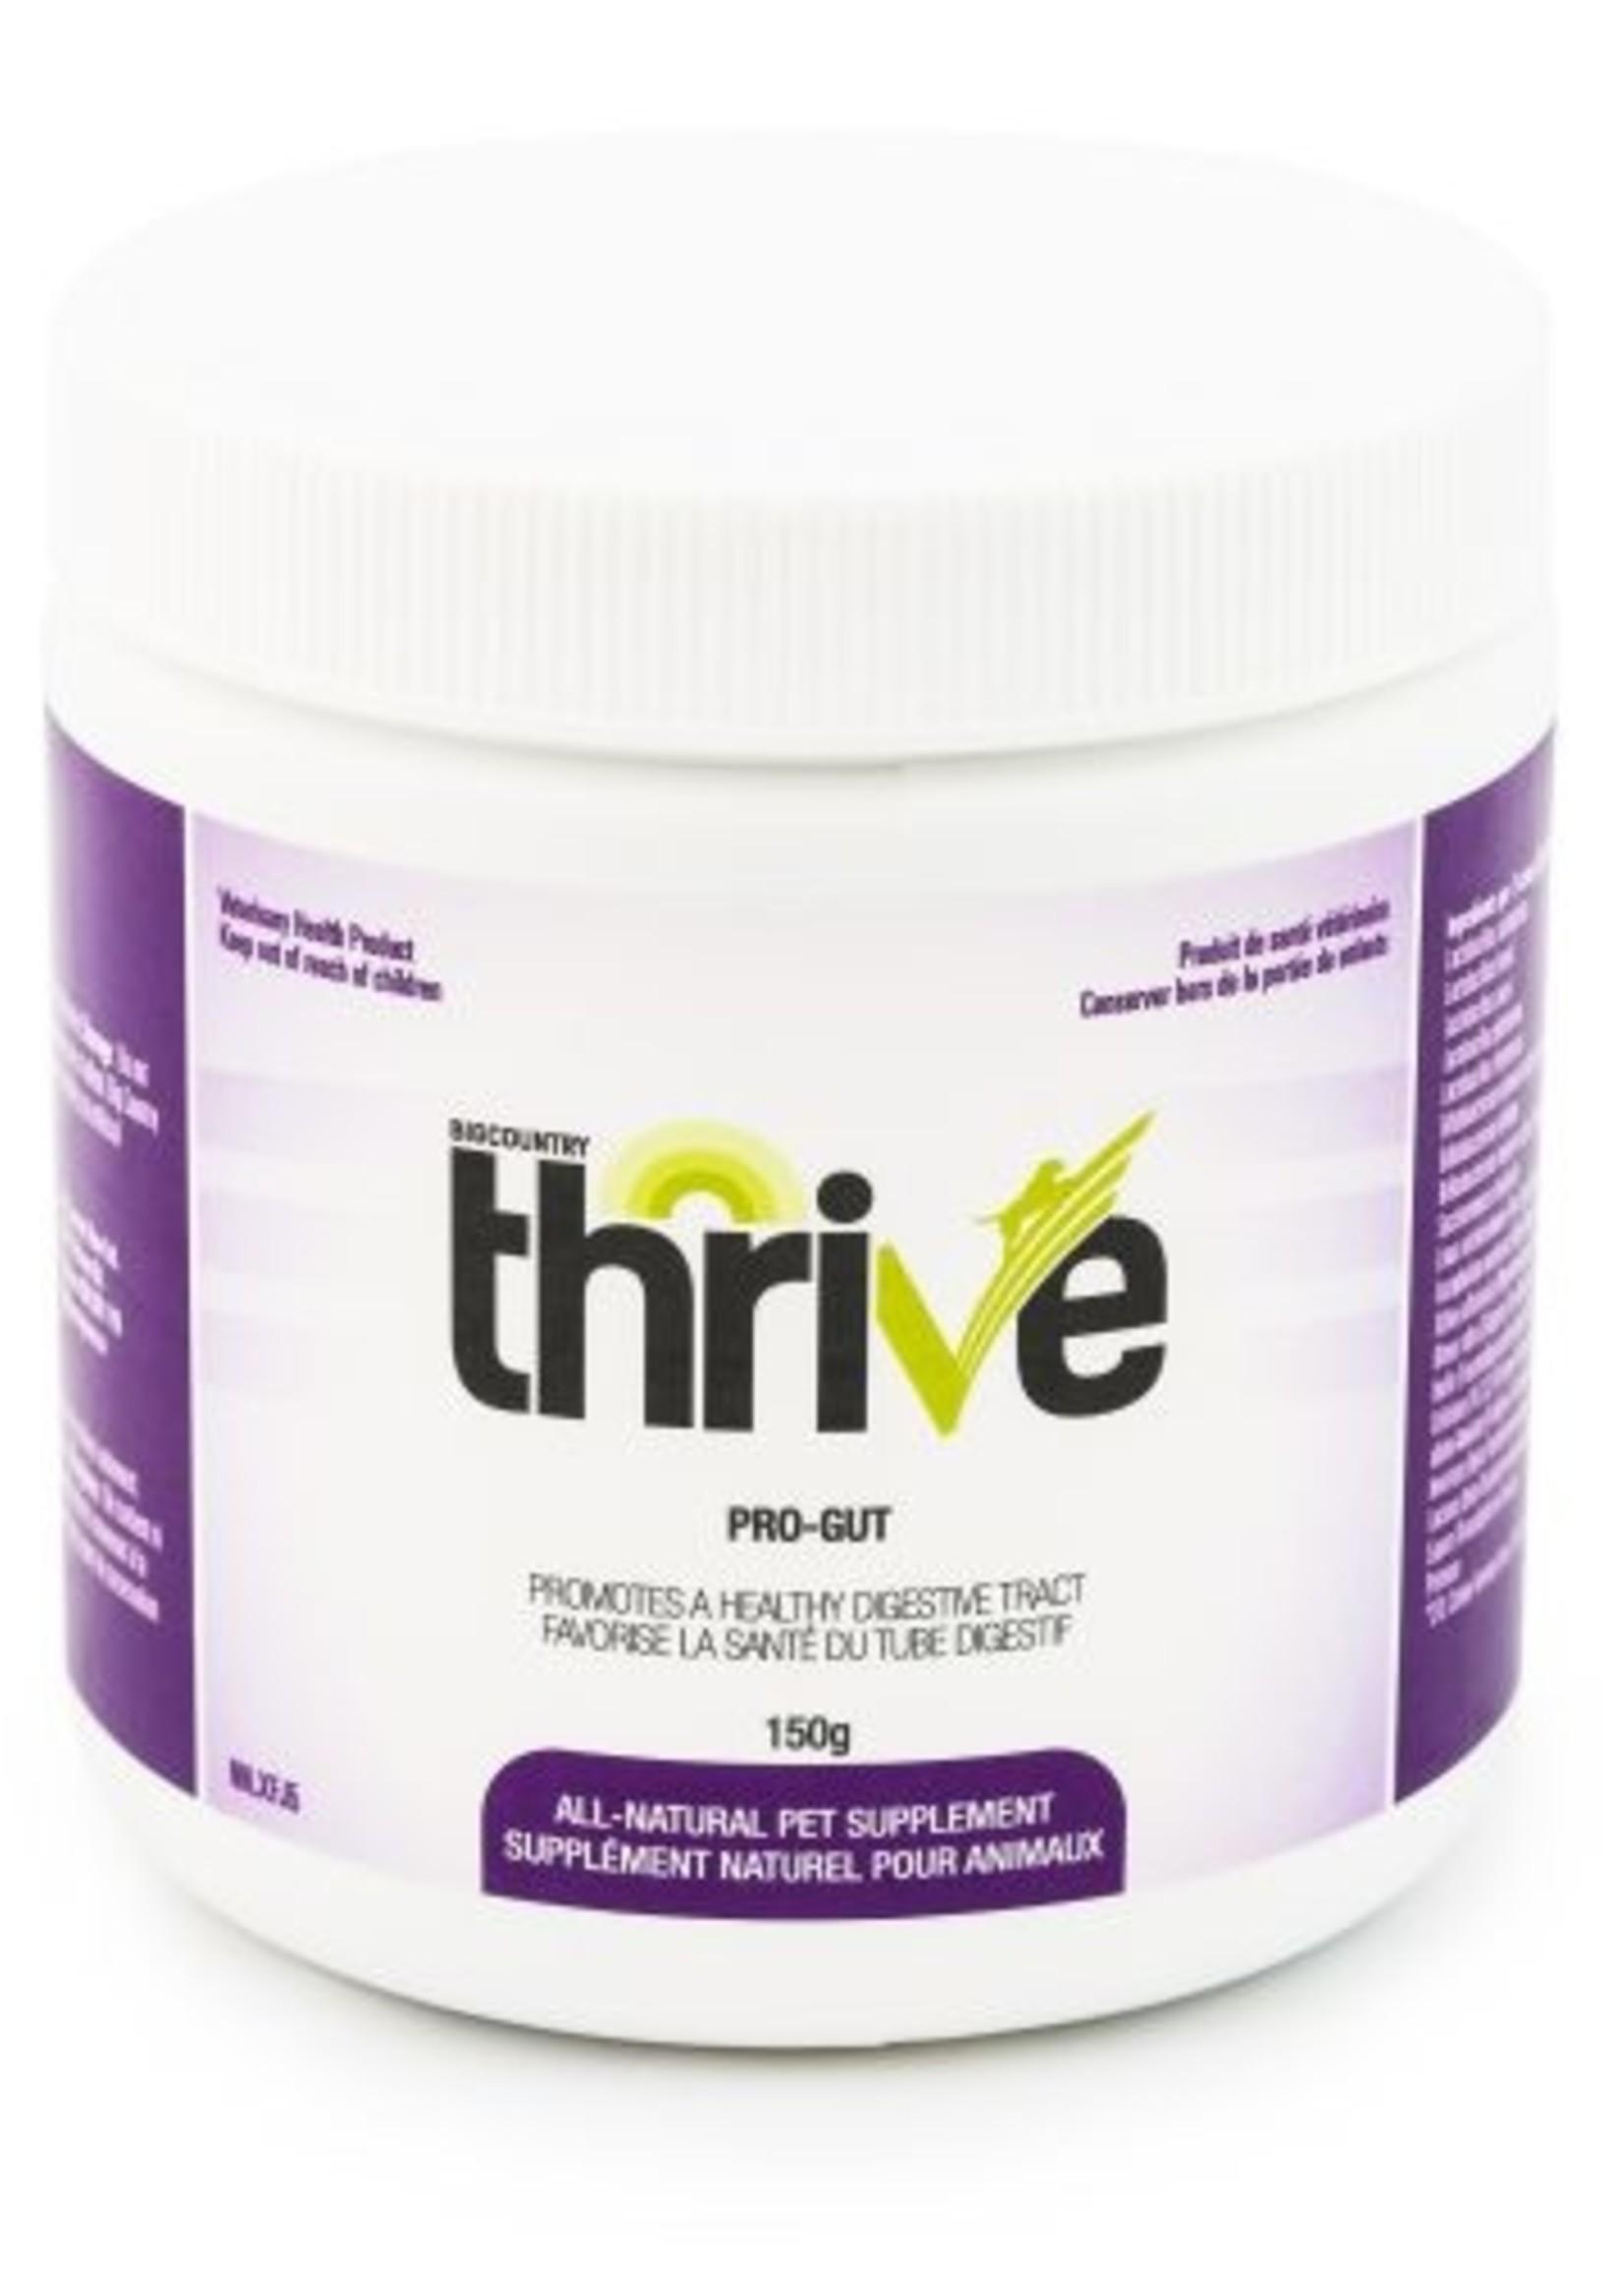 Thrive Thrive Pro-Gut 150g